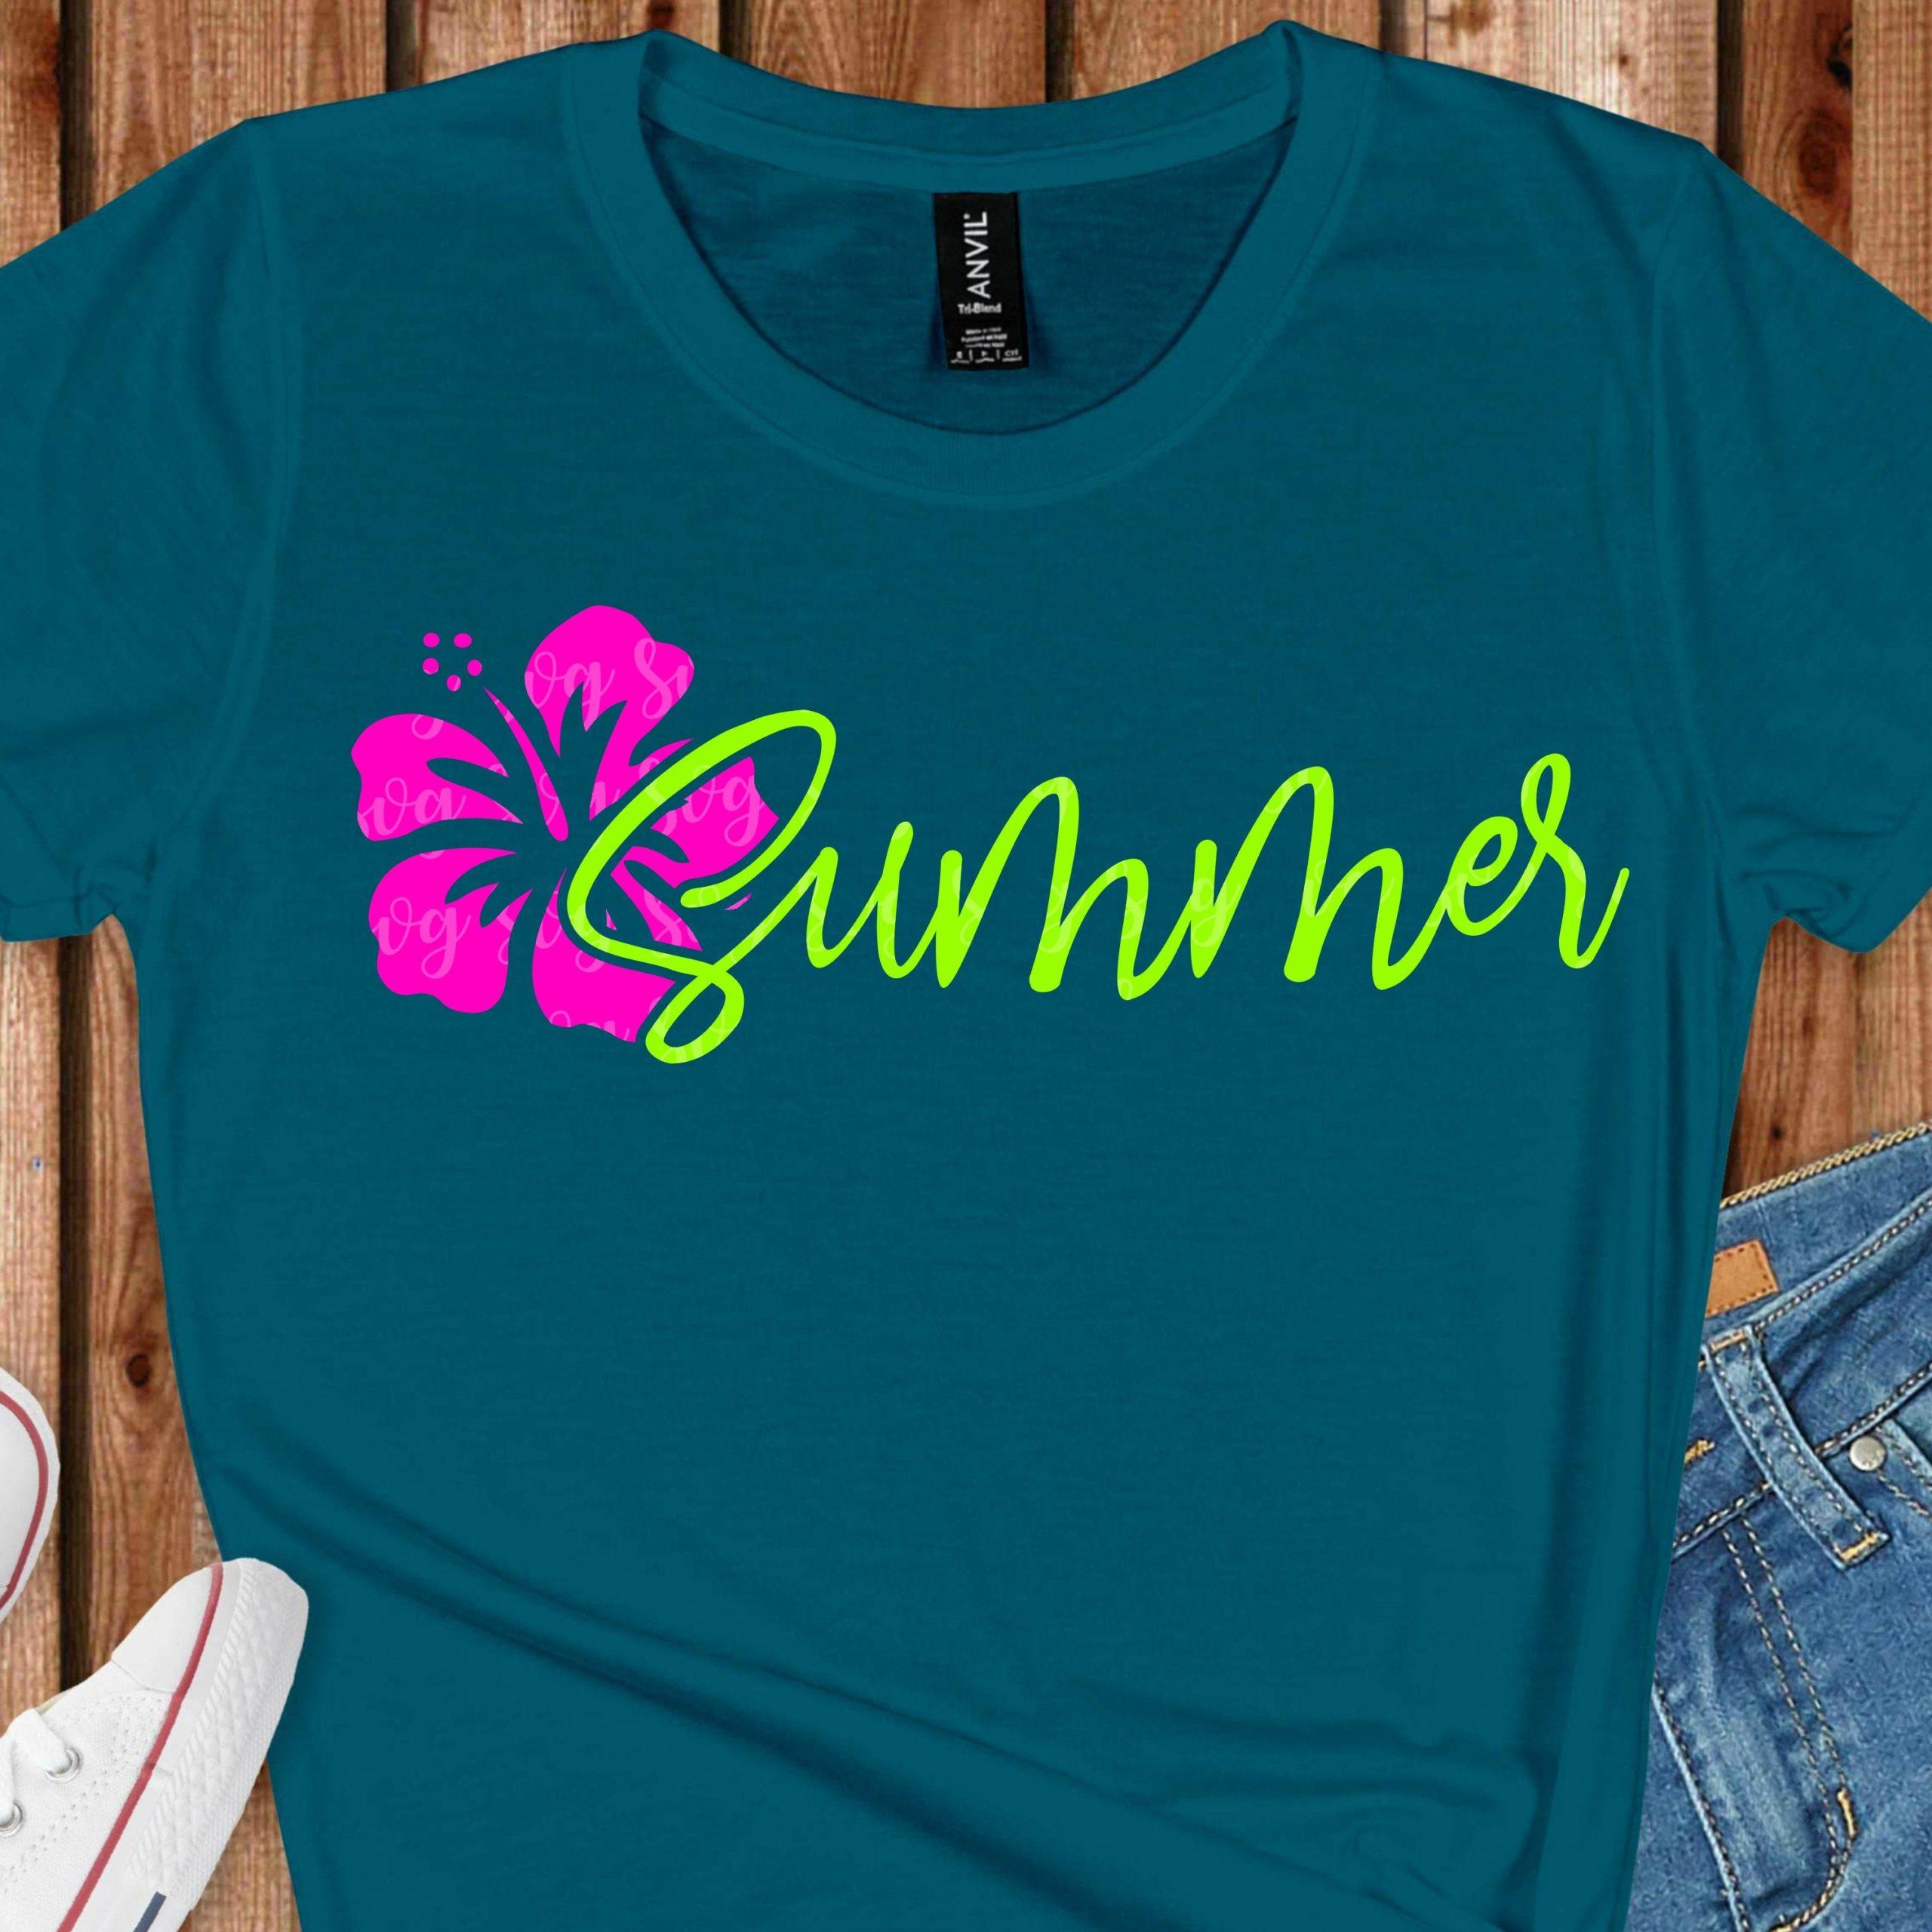 Hibiscus-summer-svg-hibiscusbeach-svg-palm-tree-svg-summer-svg-summertime-svgbeach-life-svg-beachy-svg-for-cricut-retro-beach-svg-5ef78d17